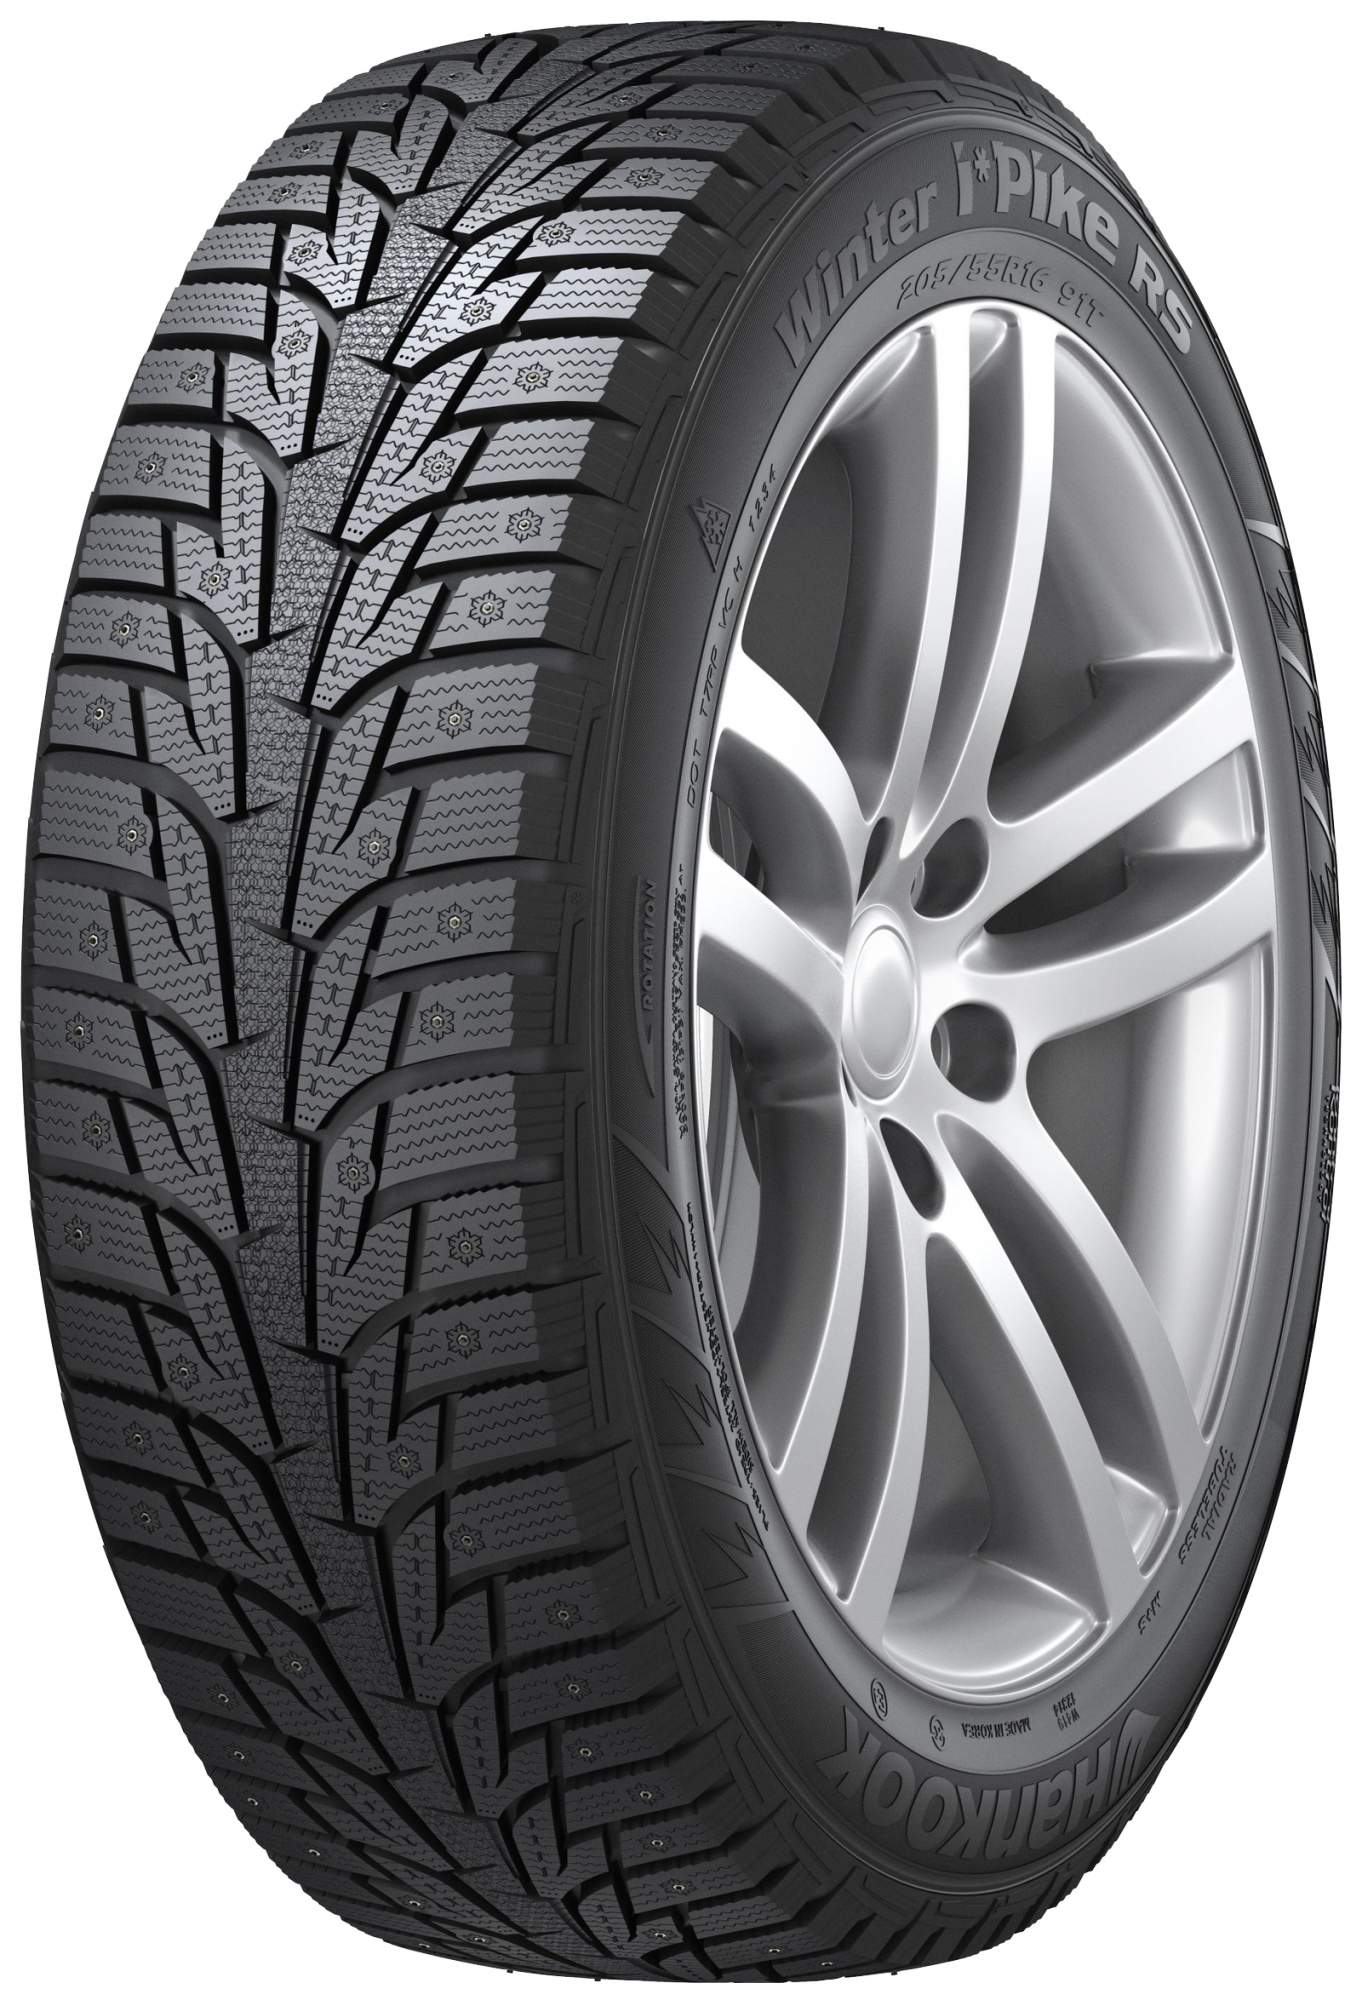 Winter i*Pike RS W419 215/70 R15 97T Зимняя Легковая